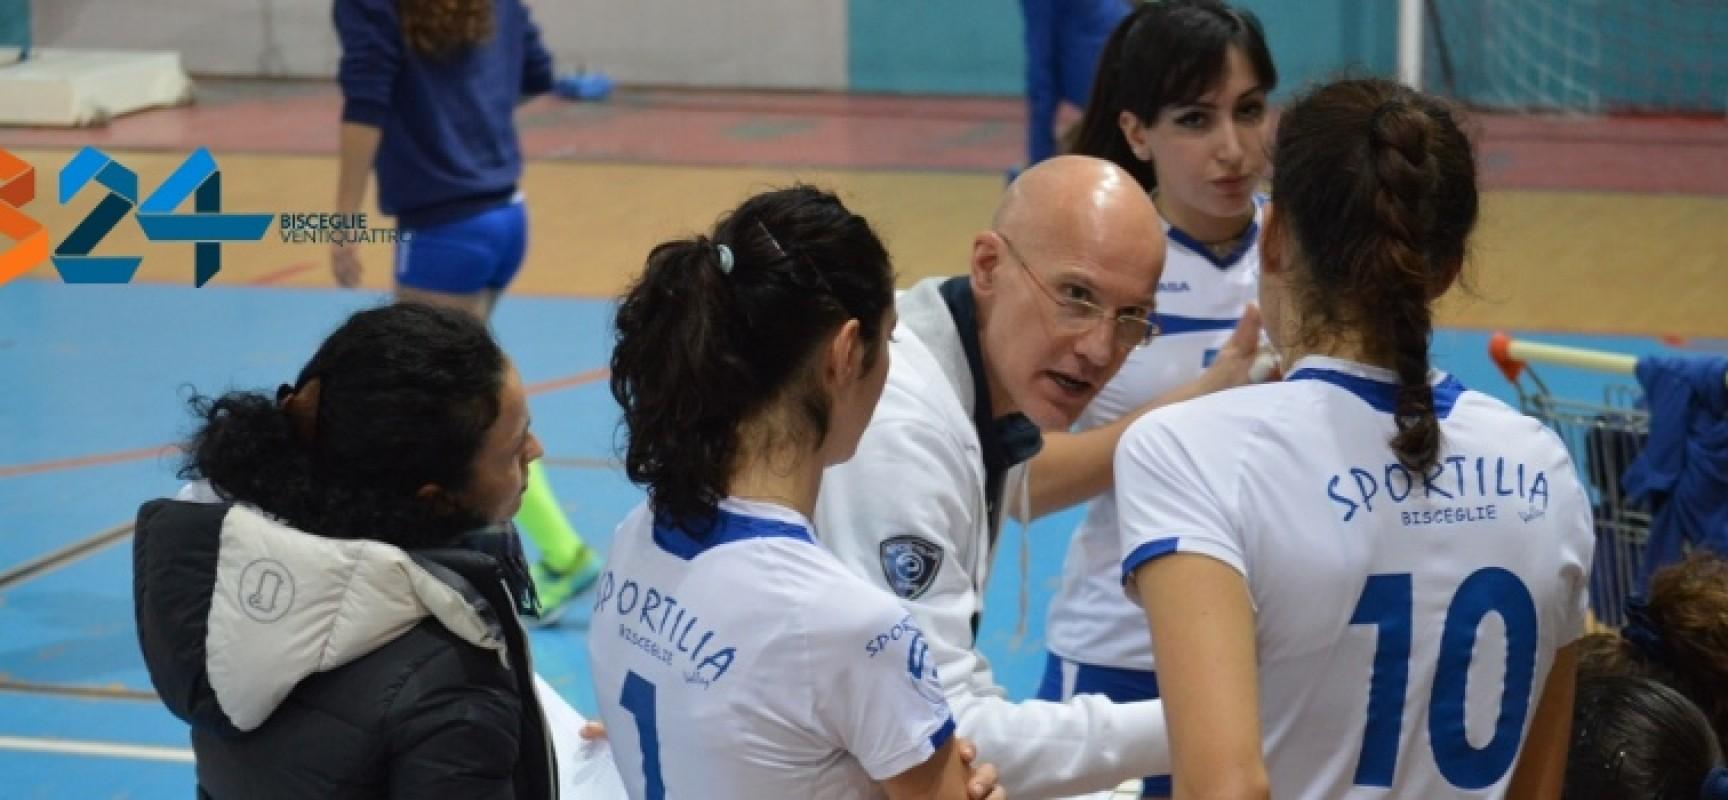 Sportilia ko, la Sebilot Manfredonia si impone al PalaDolmen